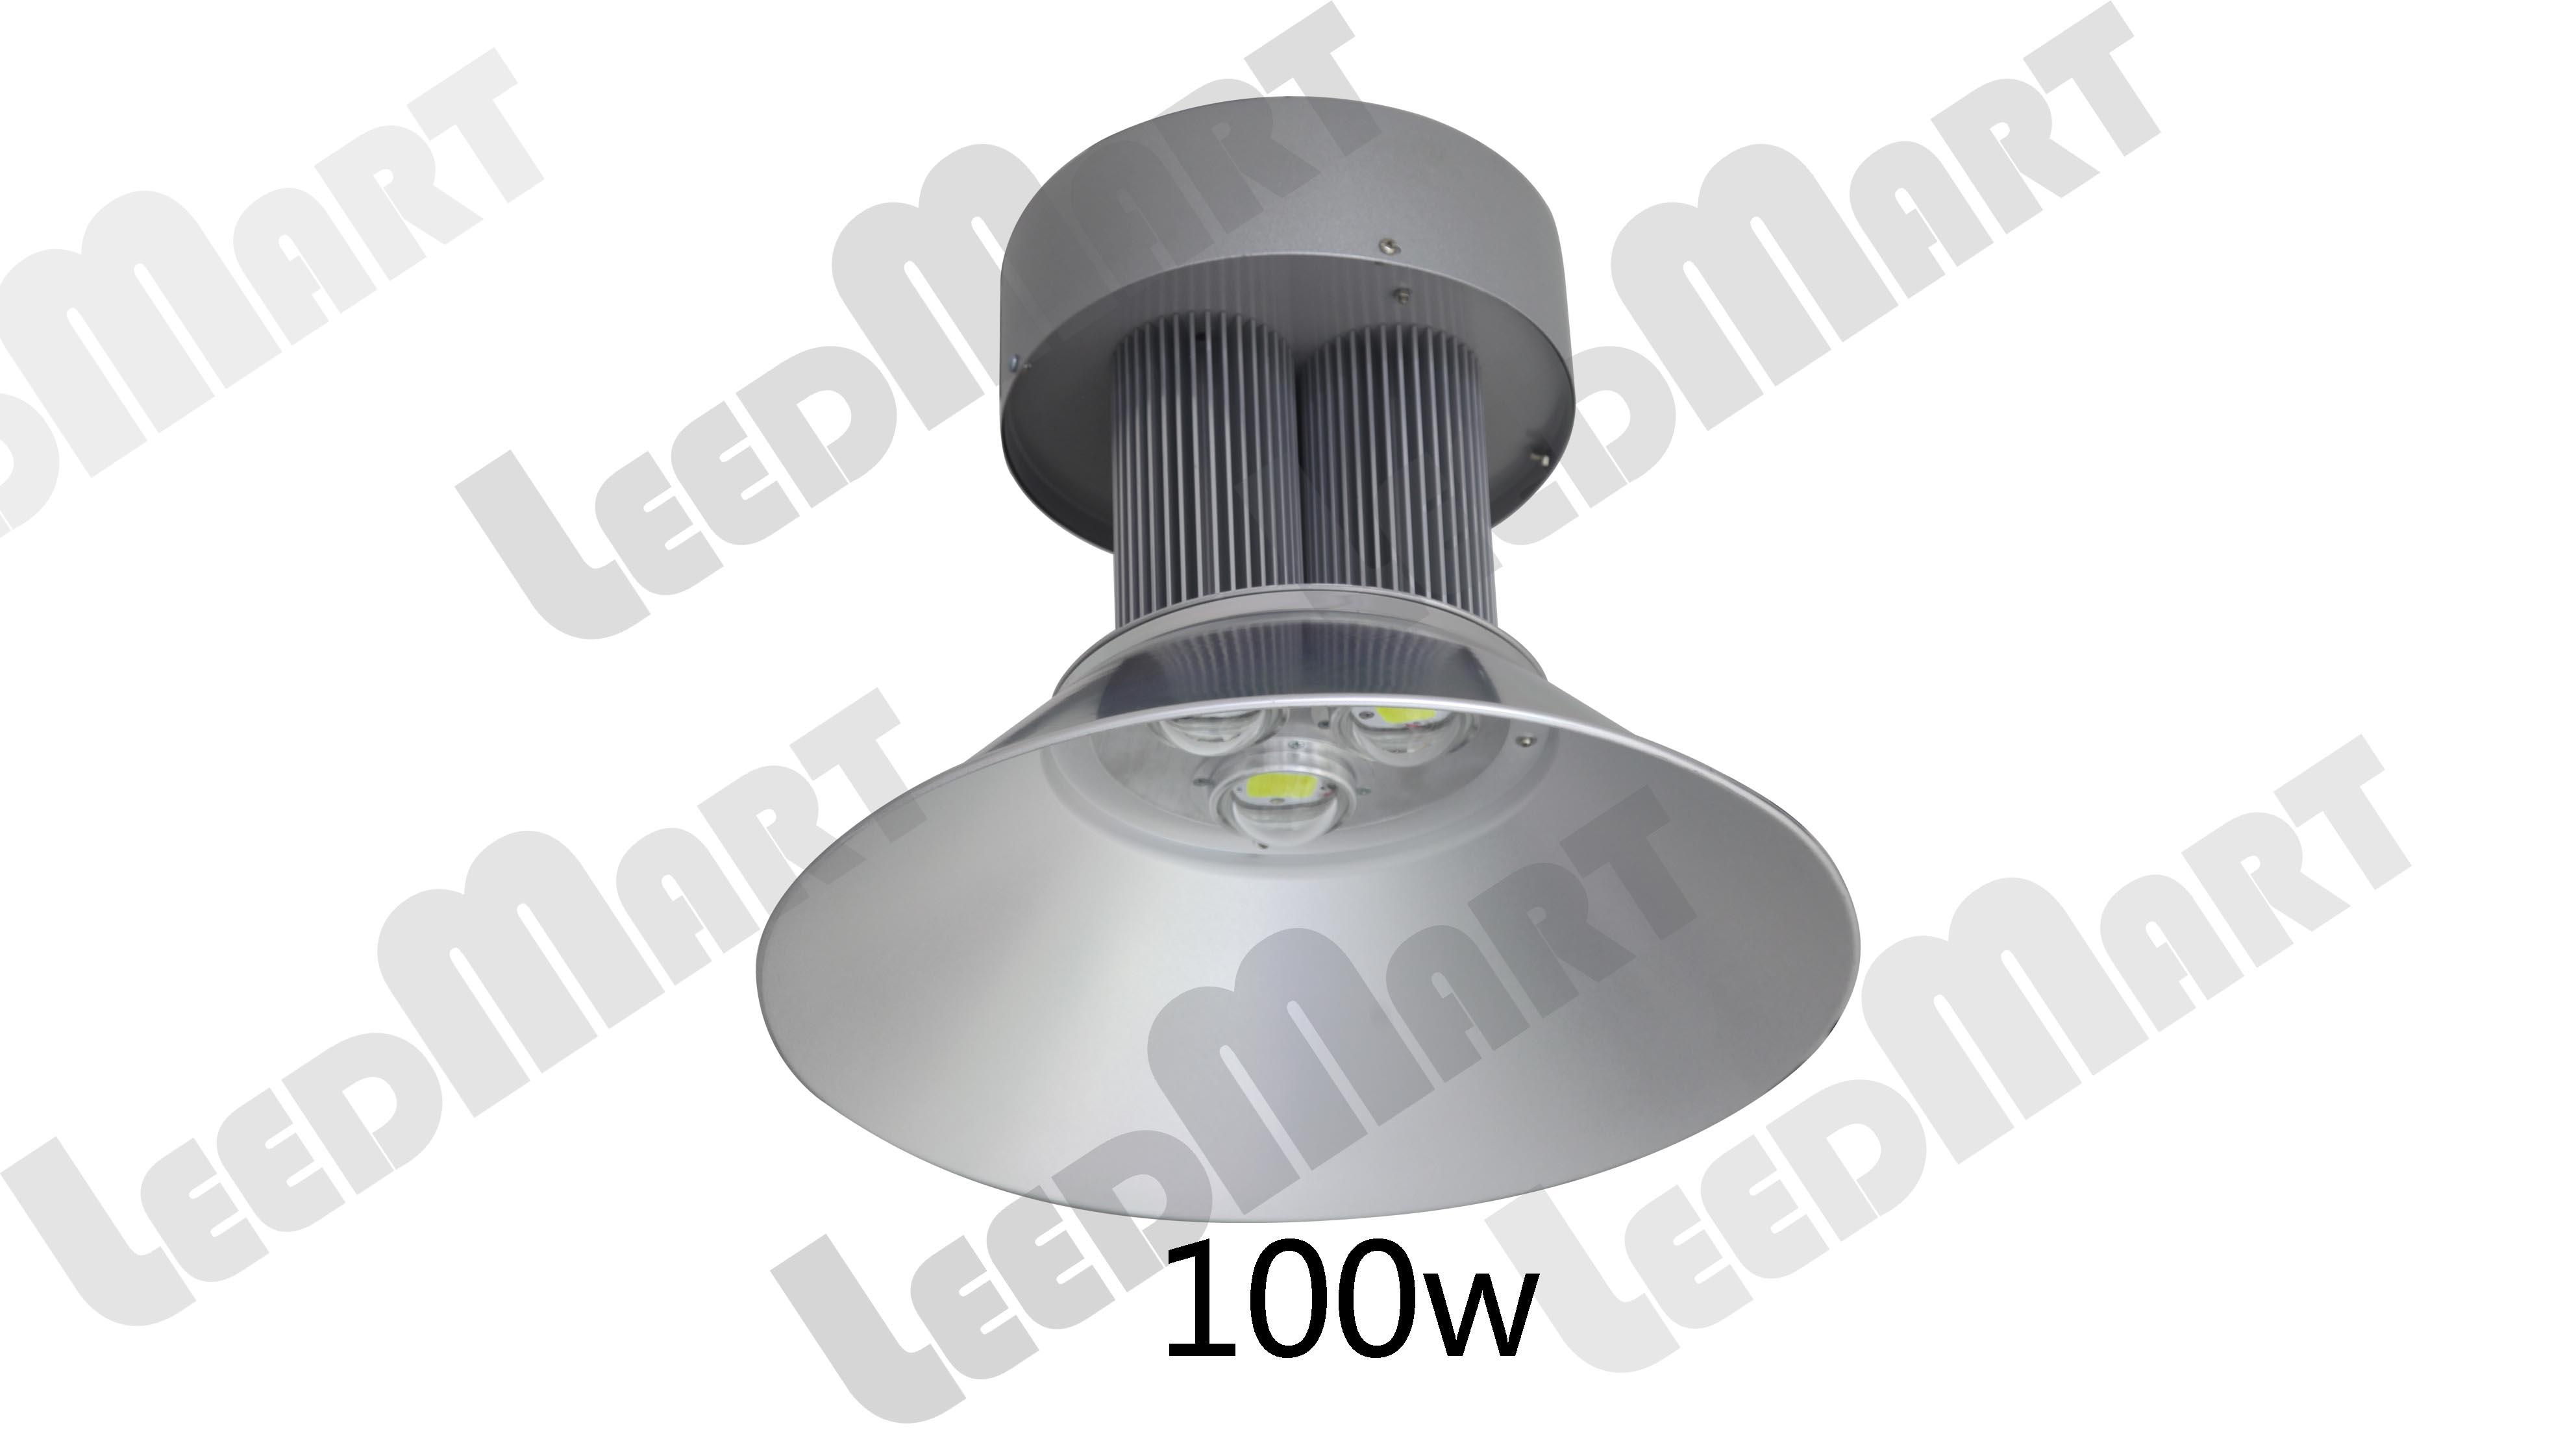 Good quality indoor 100 watt -200 watt 26000 lumen LED high bay light fixture